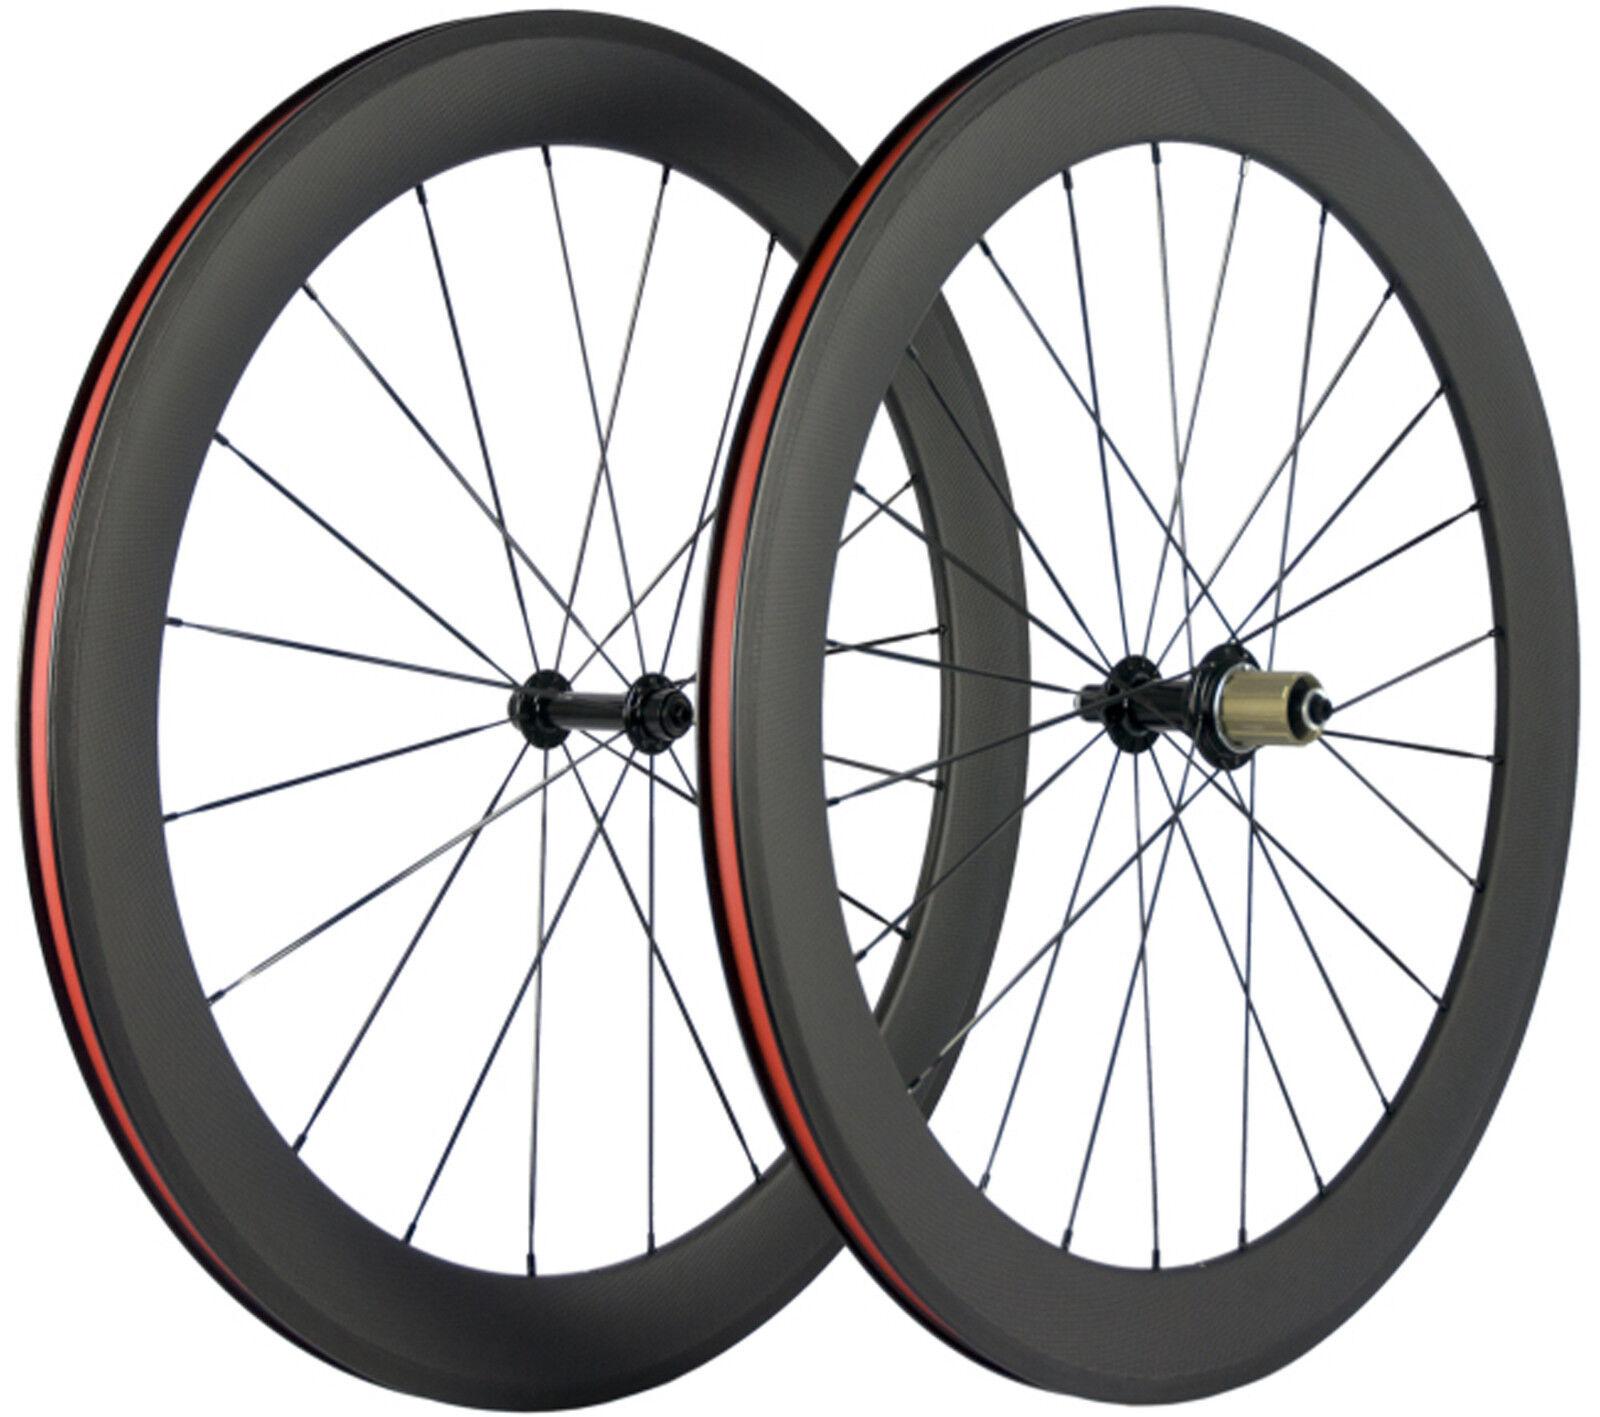 700C 60mm Tiefe Fahrrad Laufräder  Kohlefaser 3k Matte Shimano Cycle Drahtreifen  we offer various famous brand